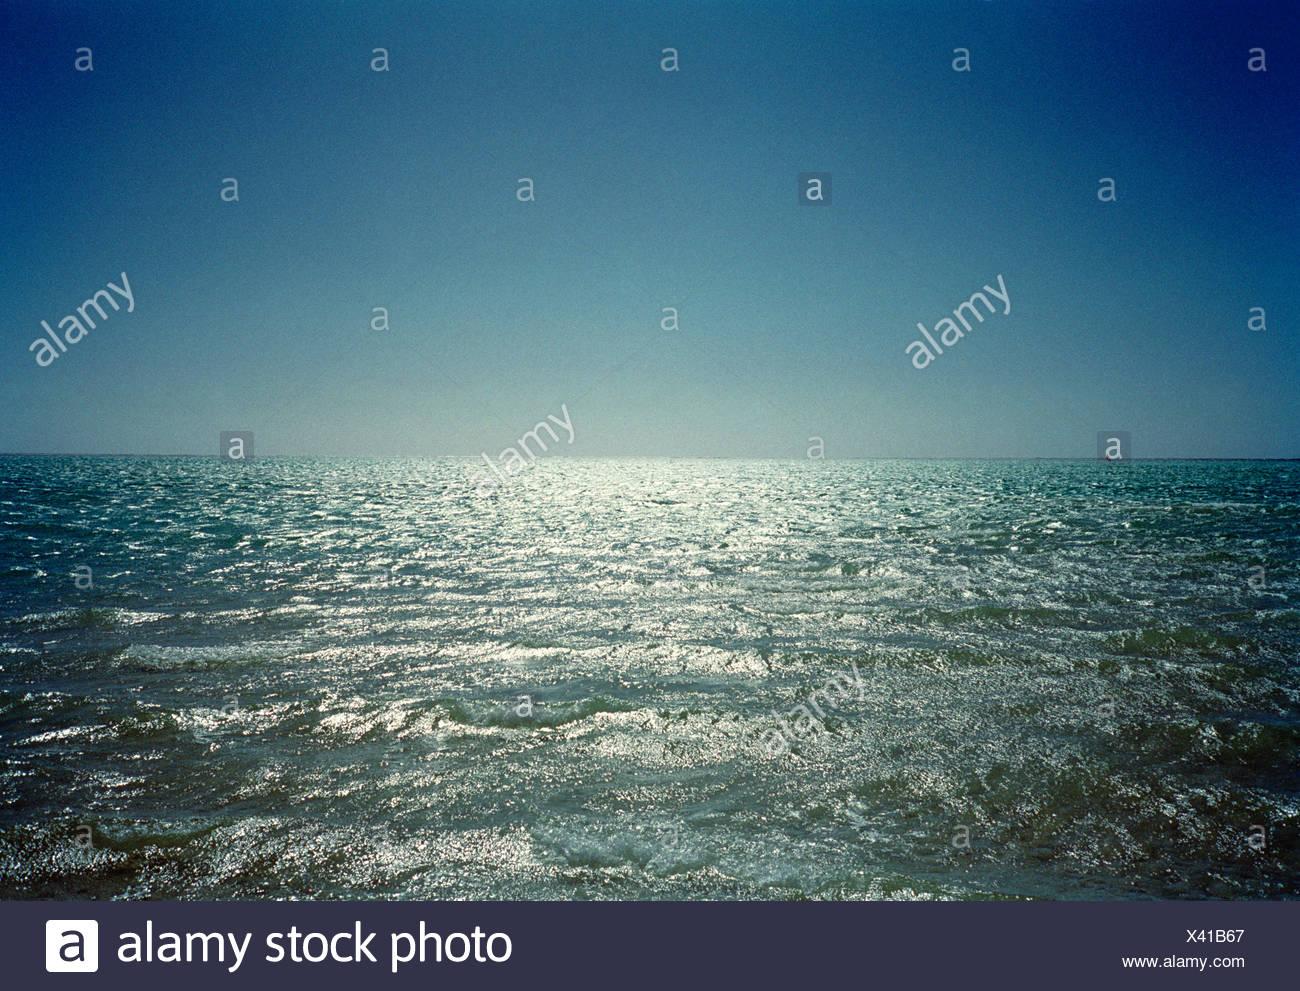 Body of water Australia - Stock Image